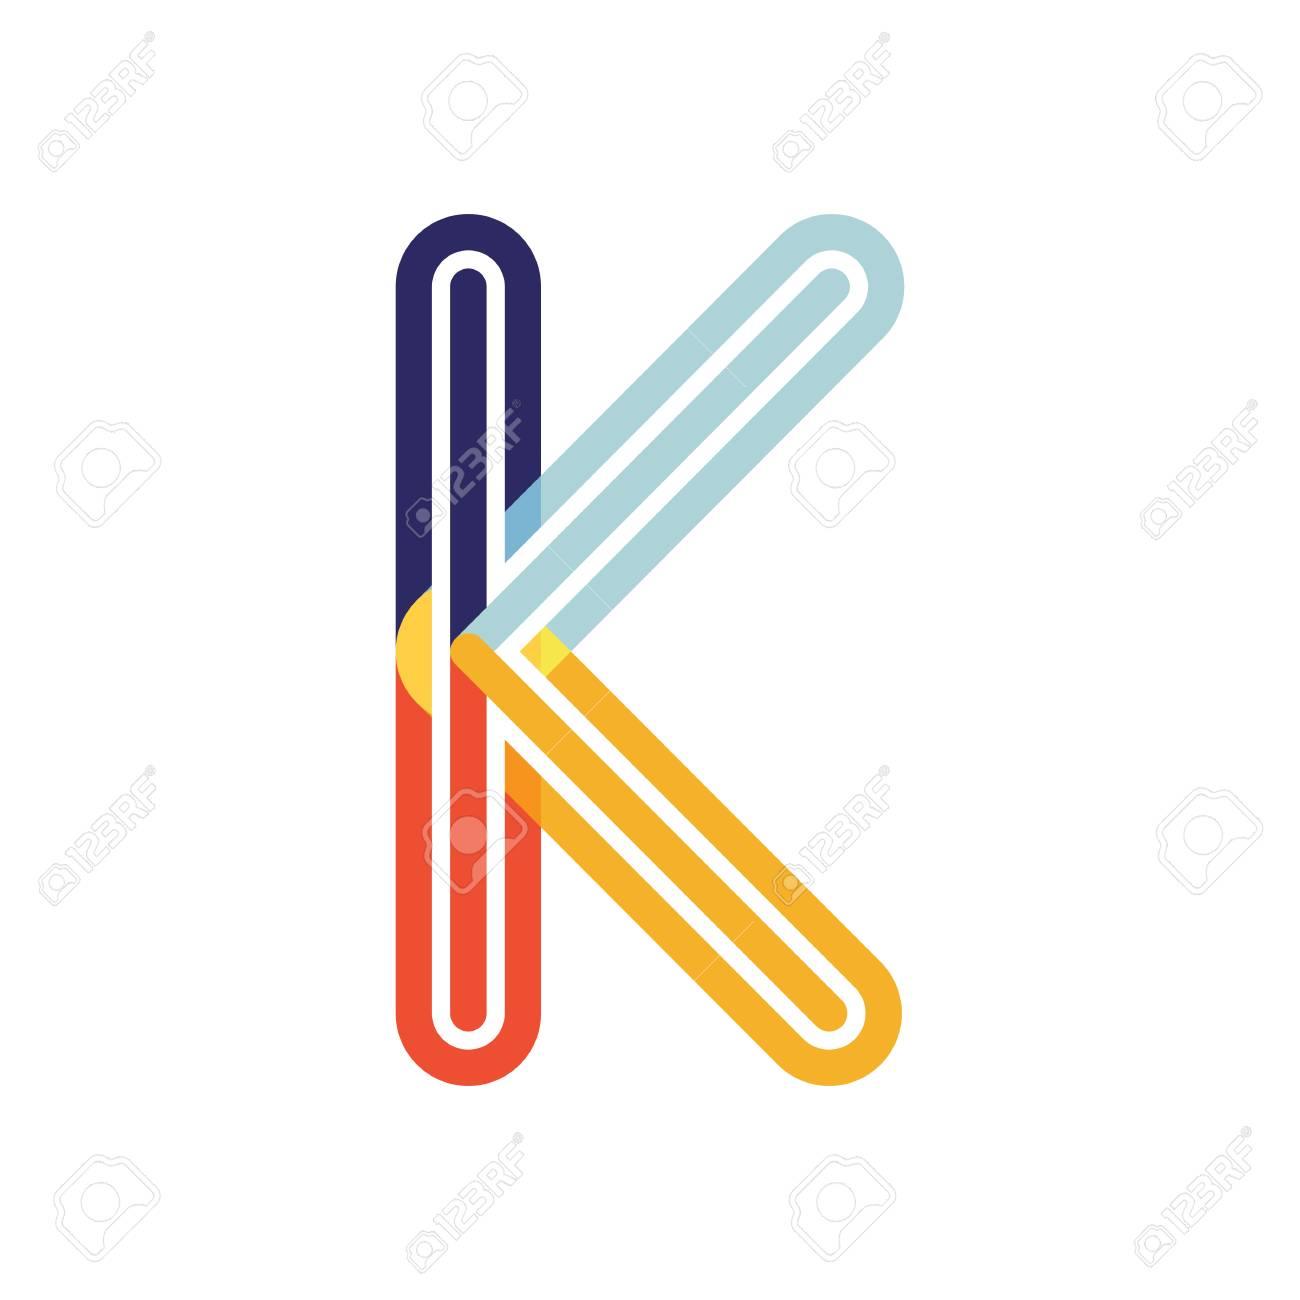 letter k colorful poly overlay logo design template element vector illustration stock vector